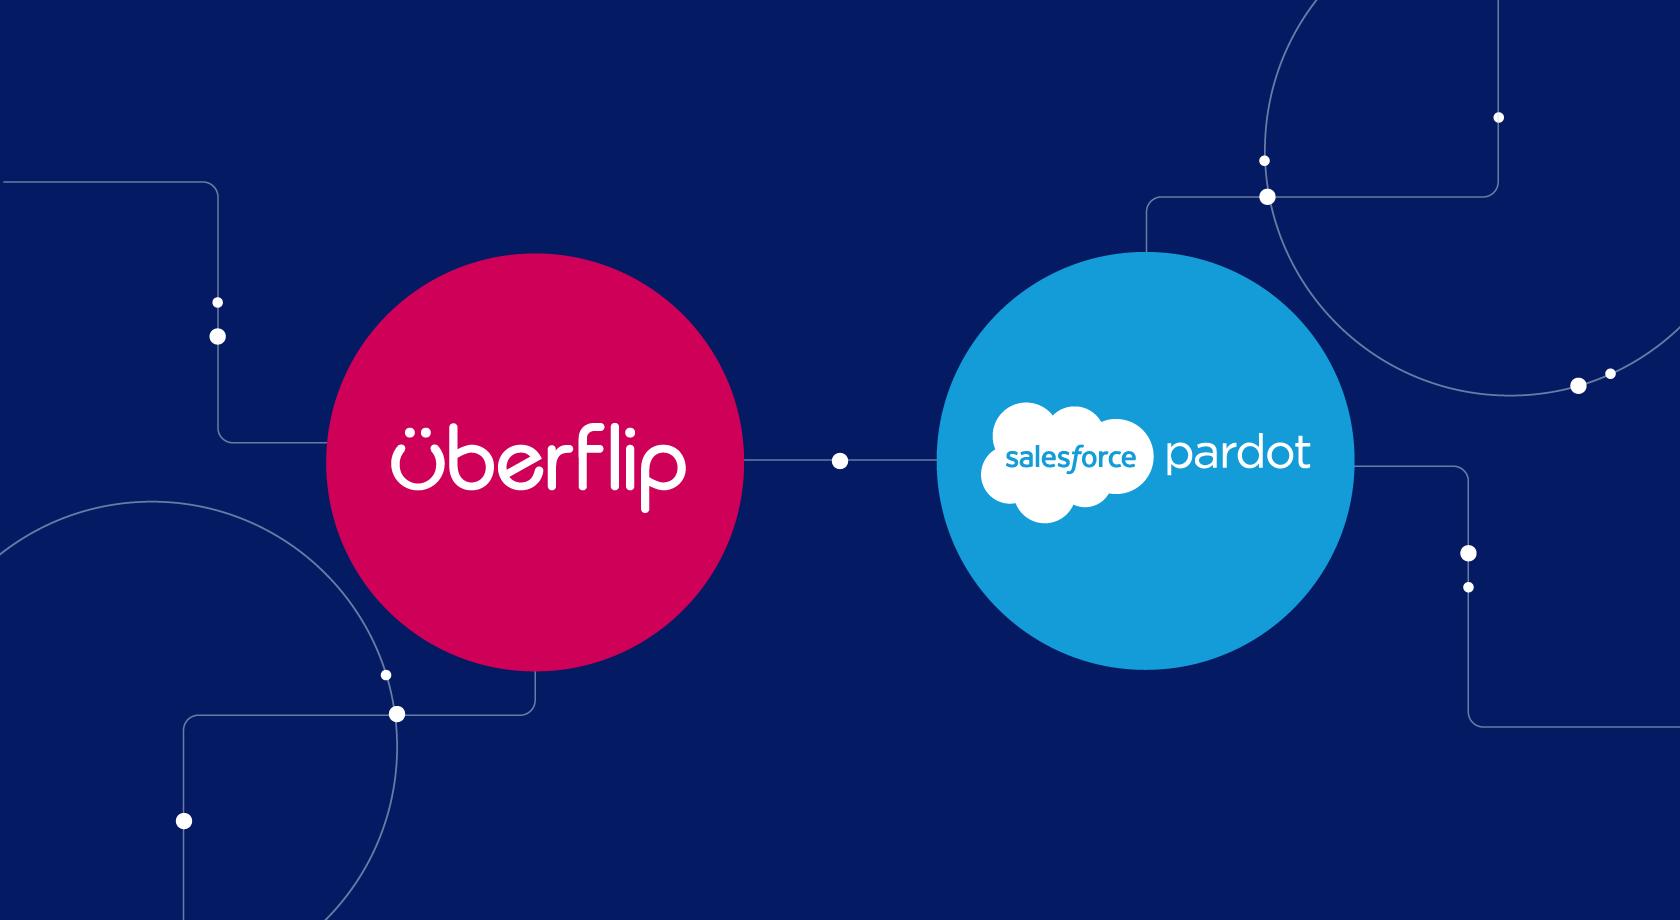 Uberflip integrating with Salesforce Pardot